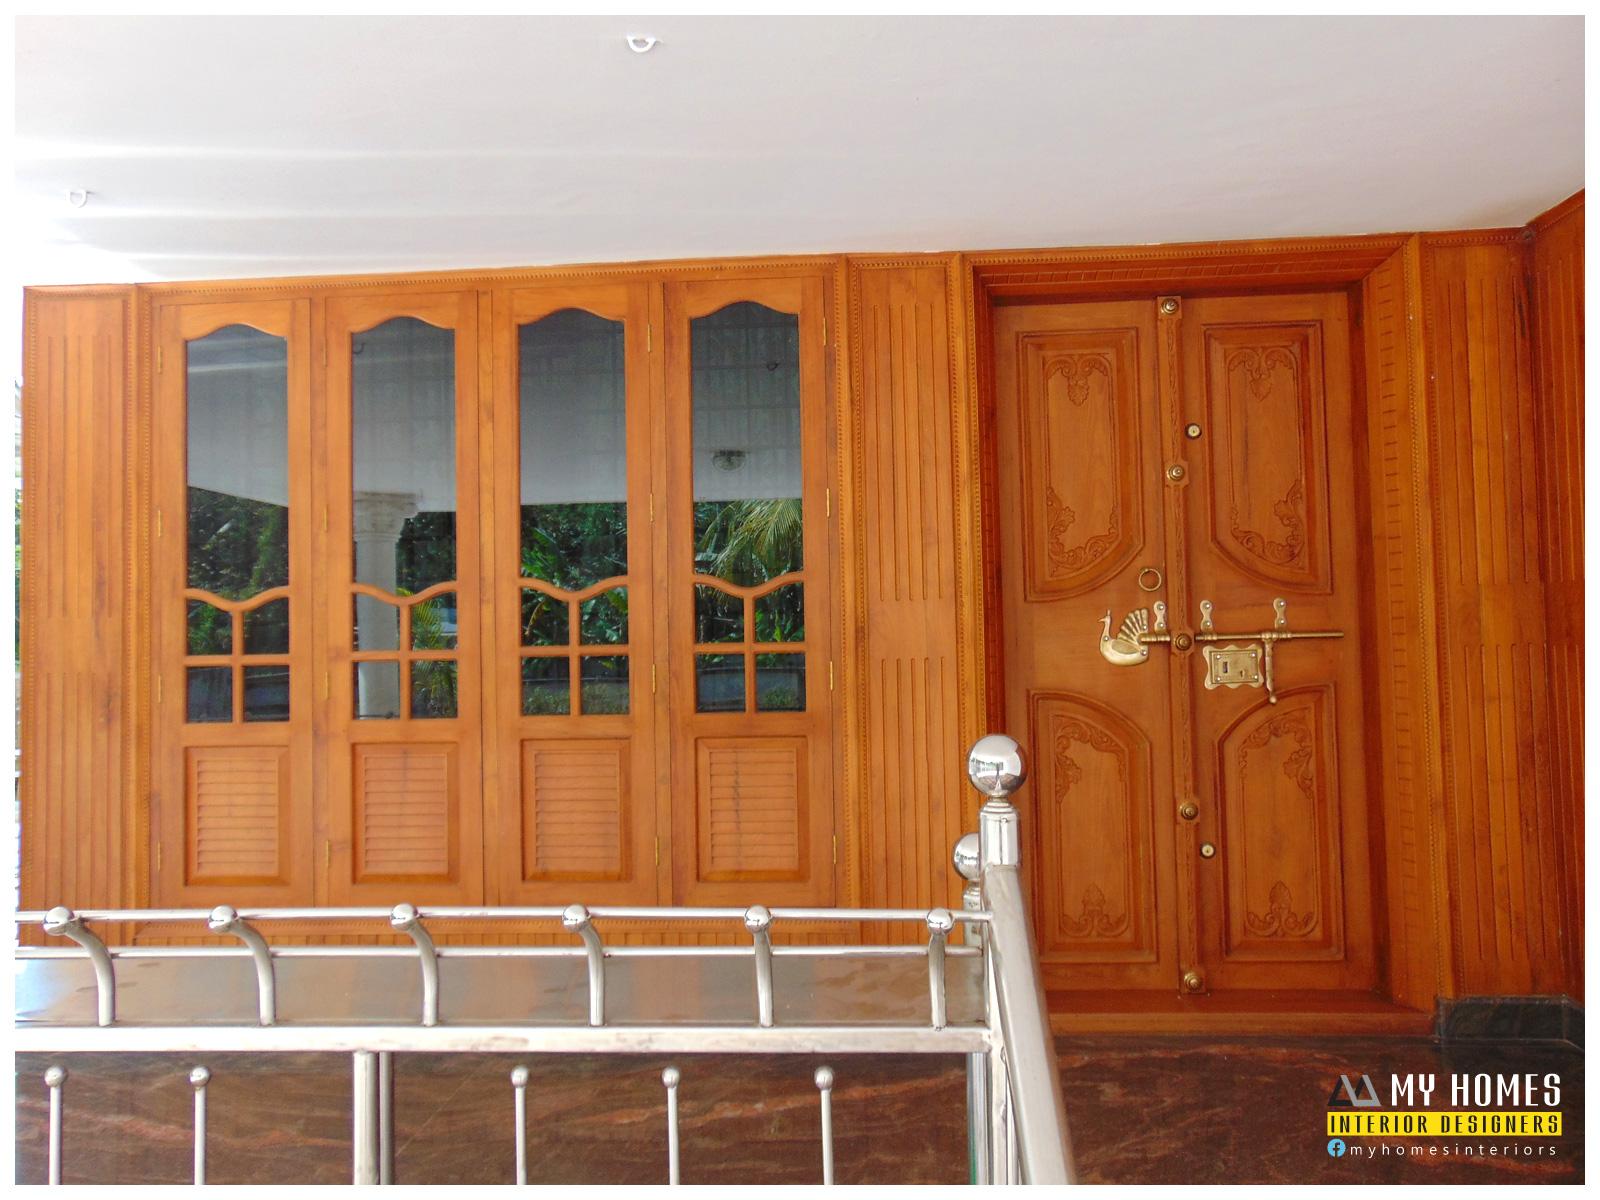 Homes house kerala front door designs ideas photos thrissur